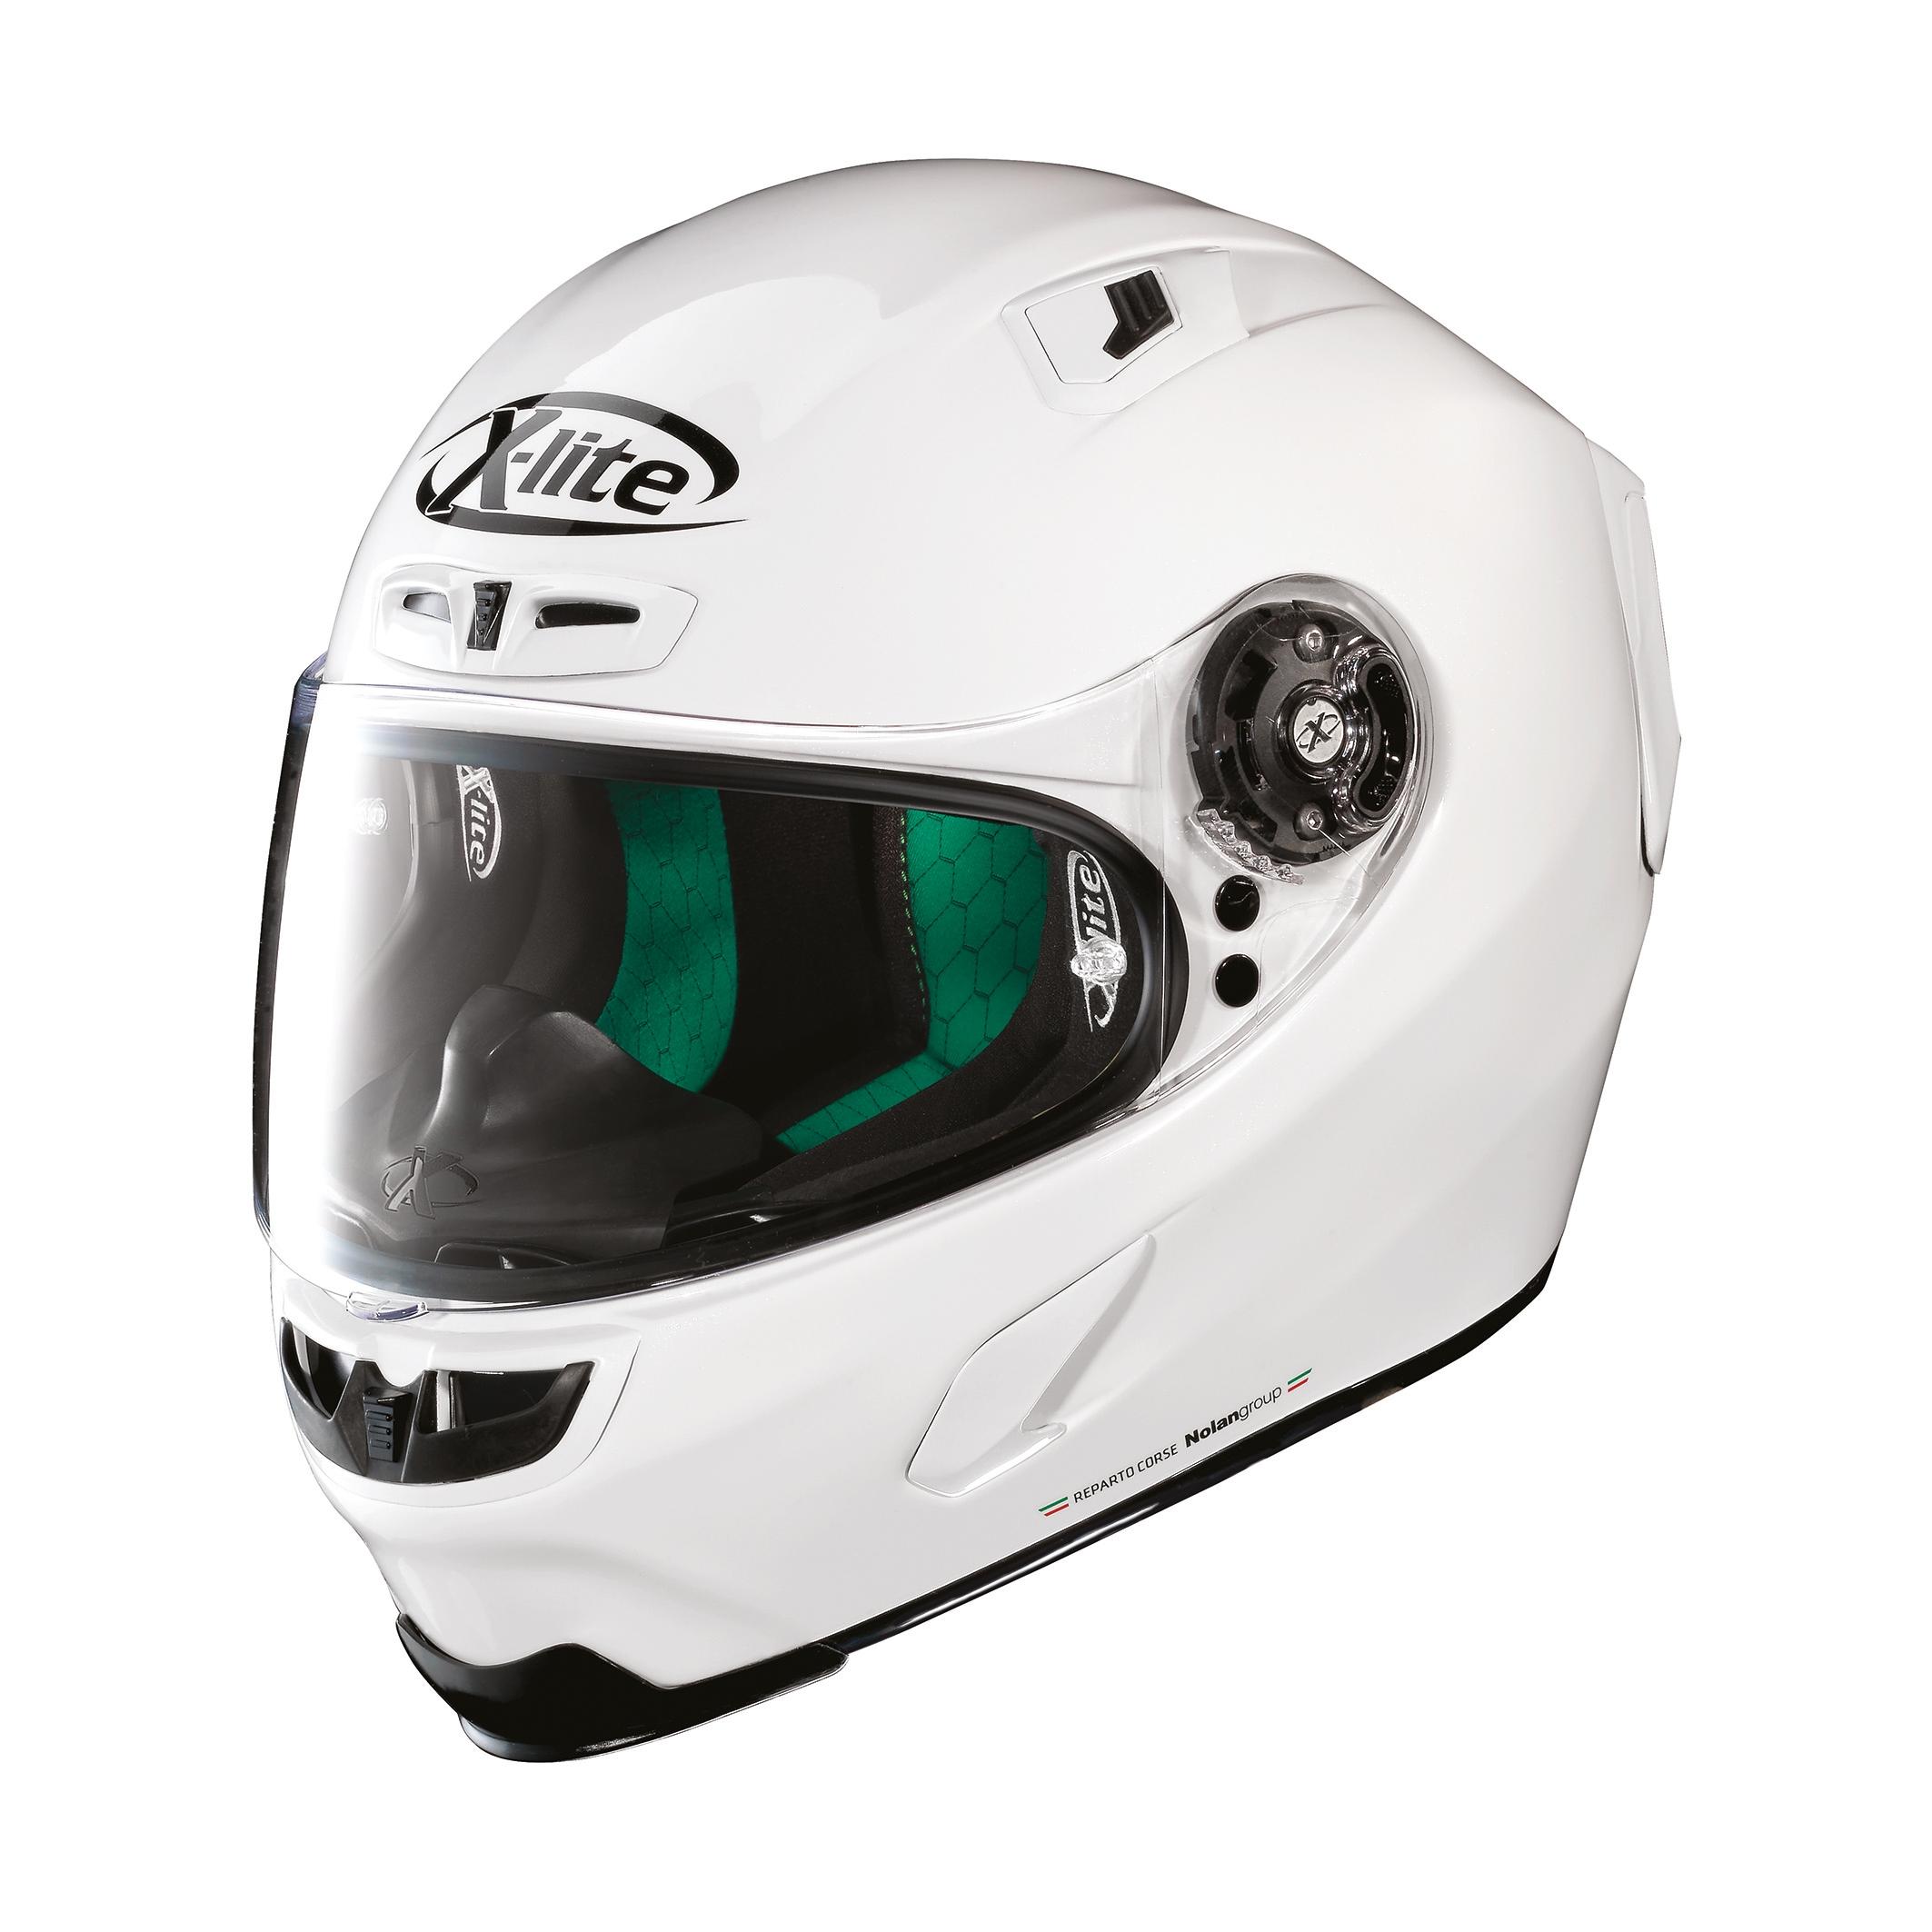 Moto helma X-Lite X-803 Start Metal White 3